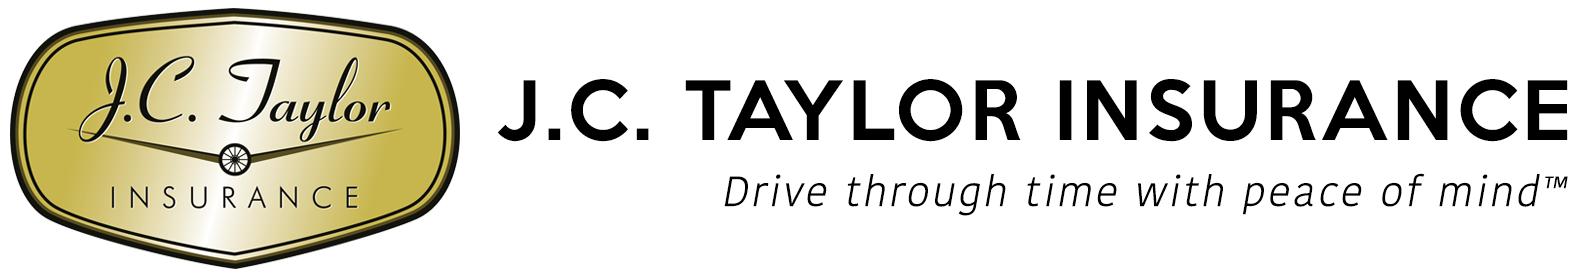 JC TAYLOR CLASSIC CAR INSURANCE.png